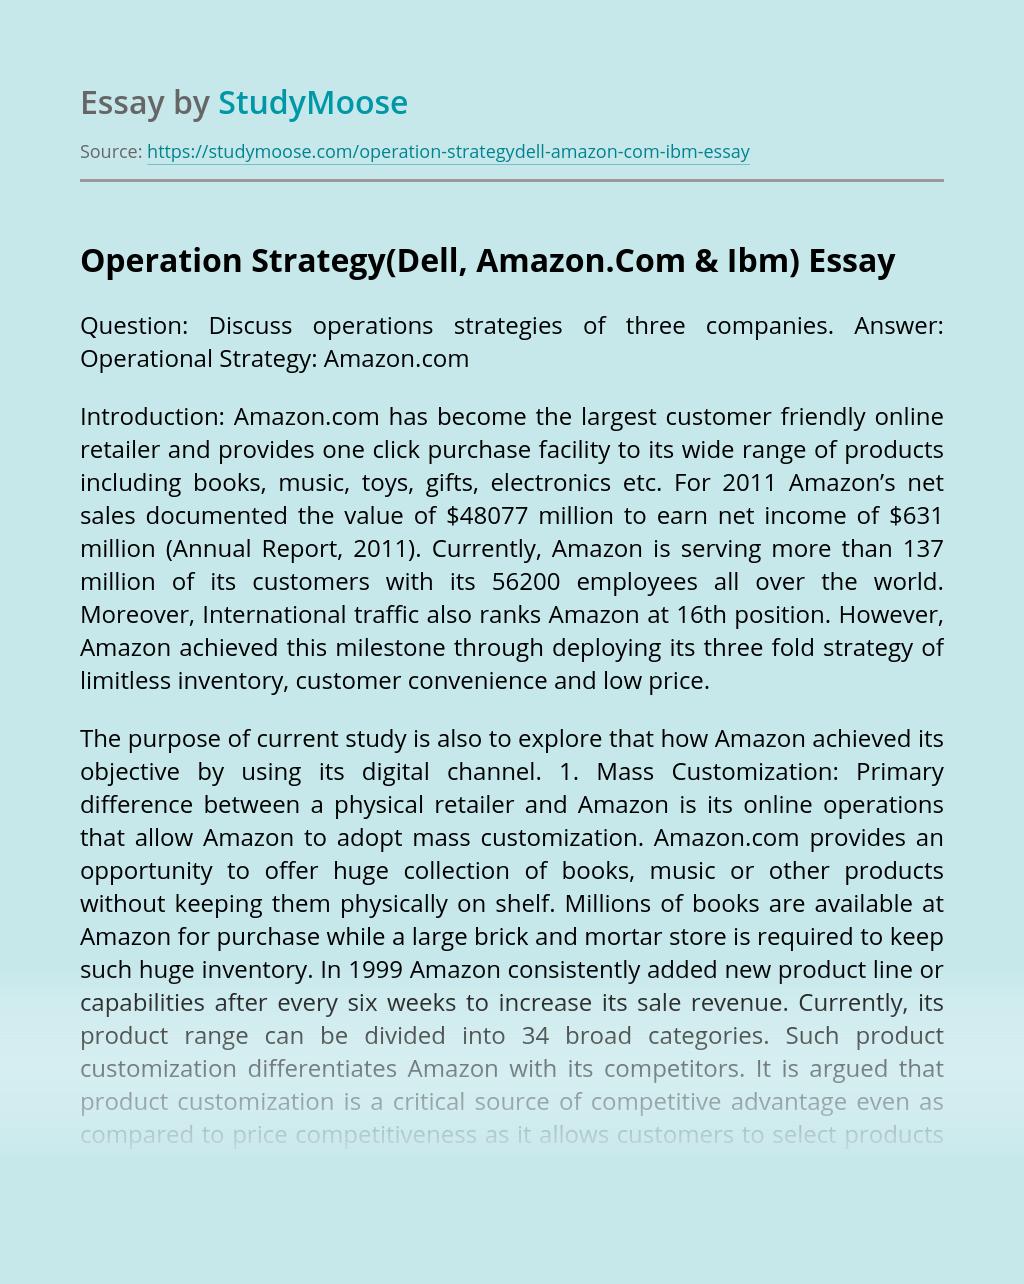 Operation Strategy(Dell, Amazon.Com & Ibm)